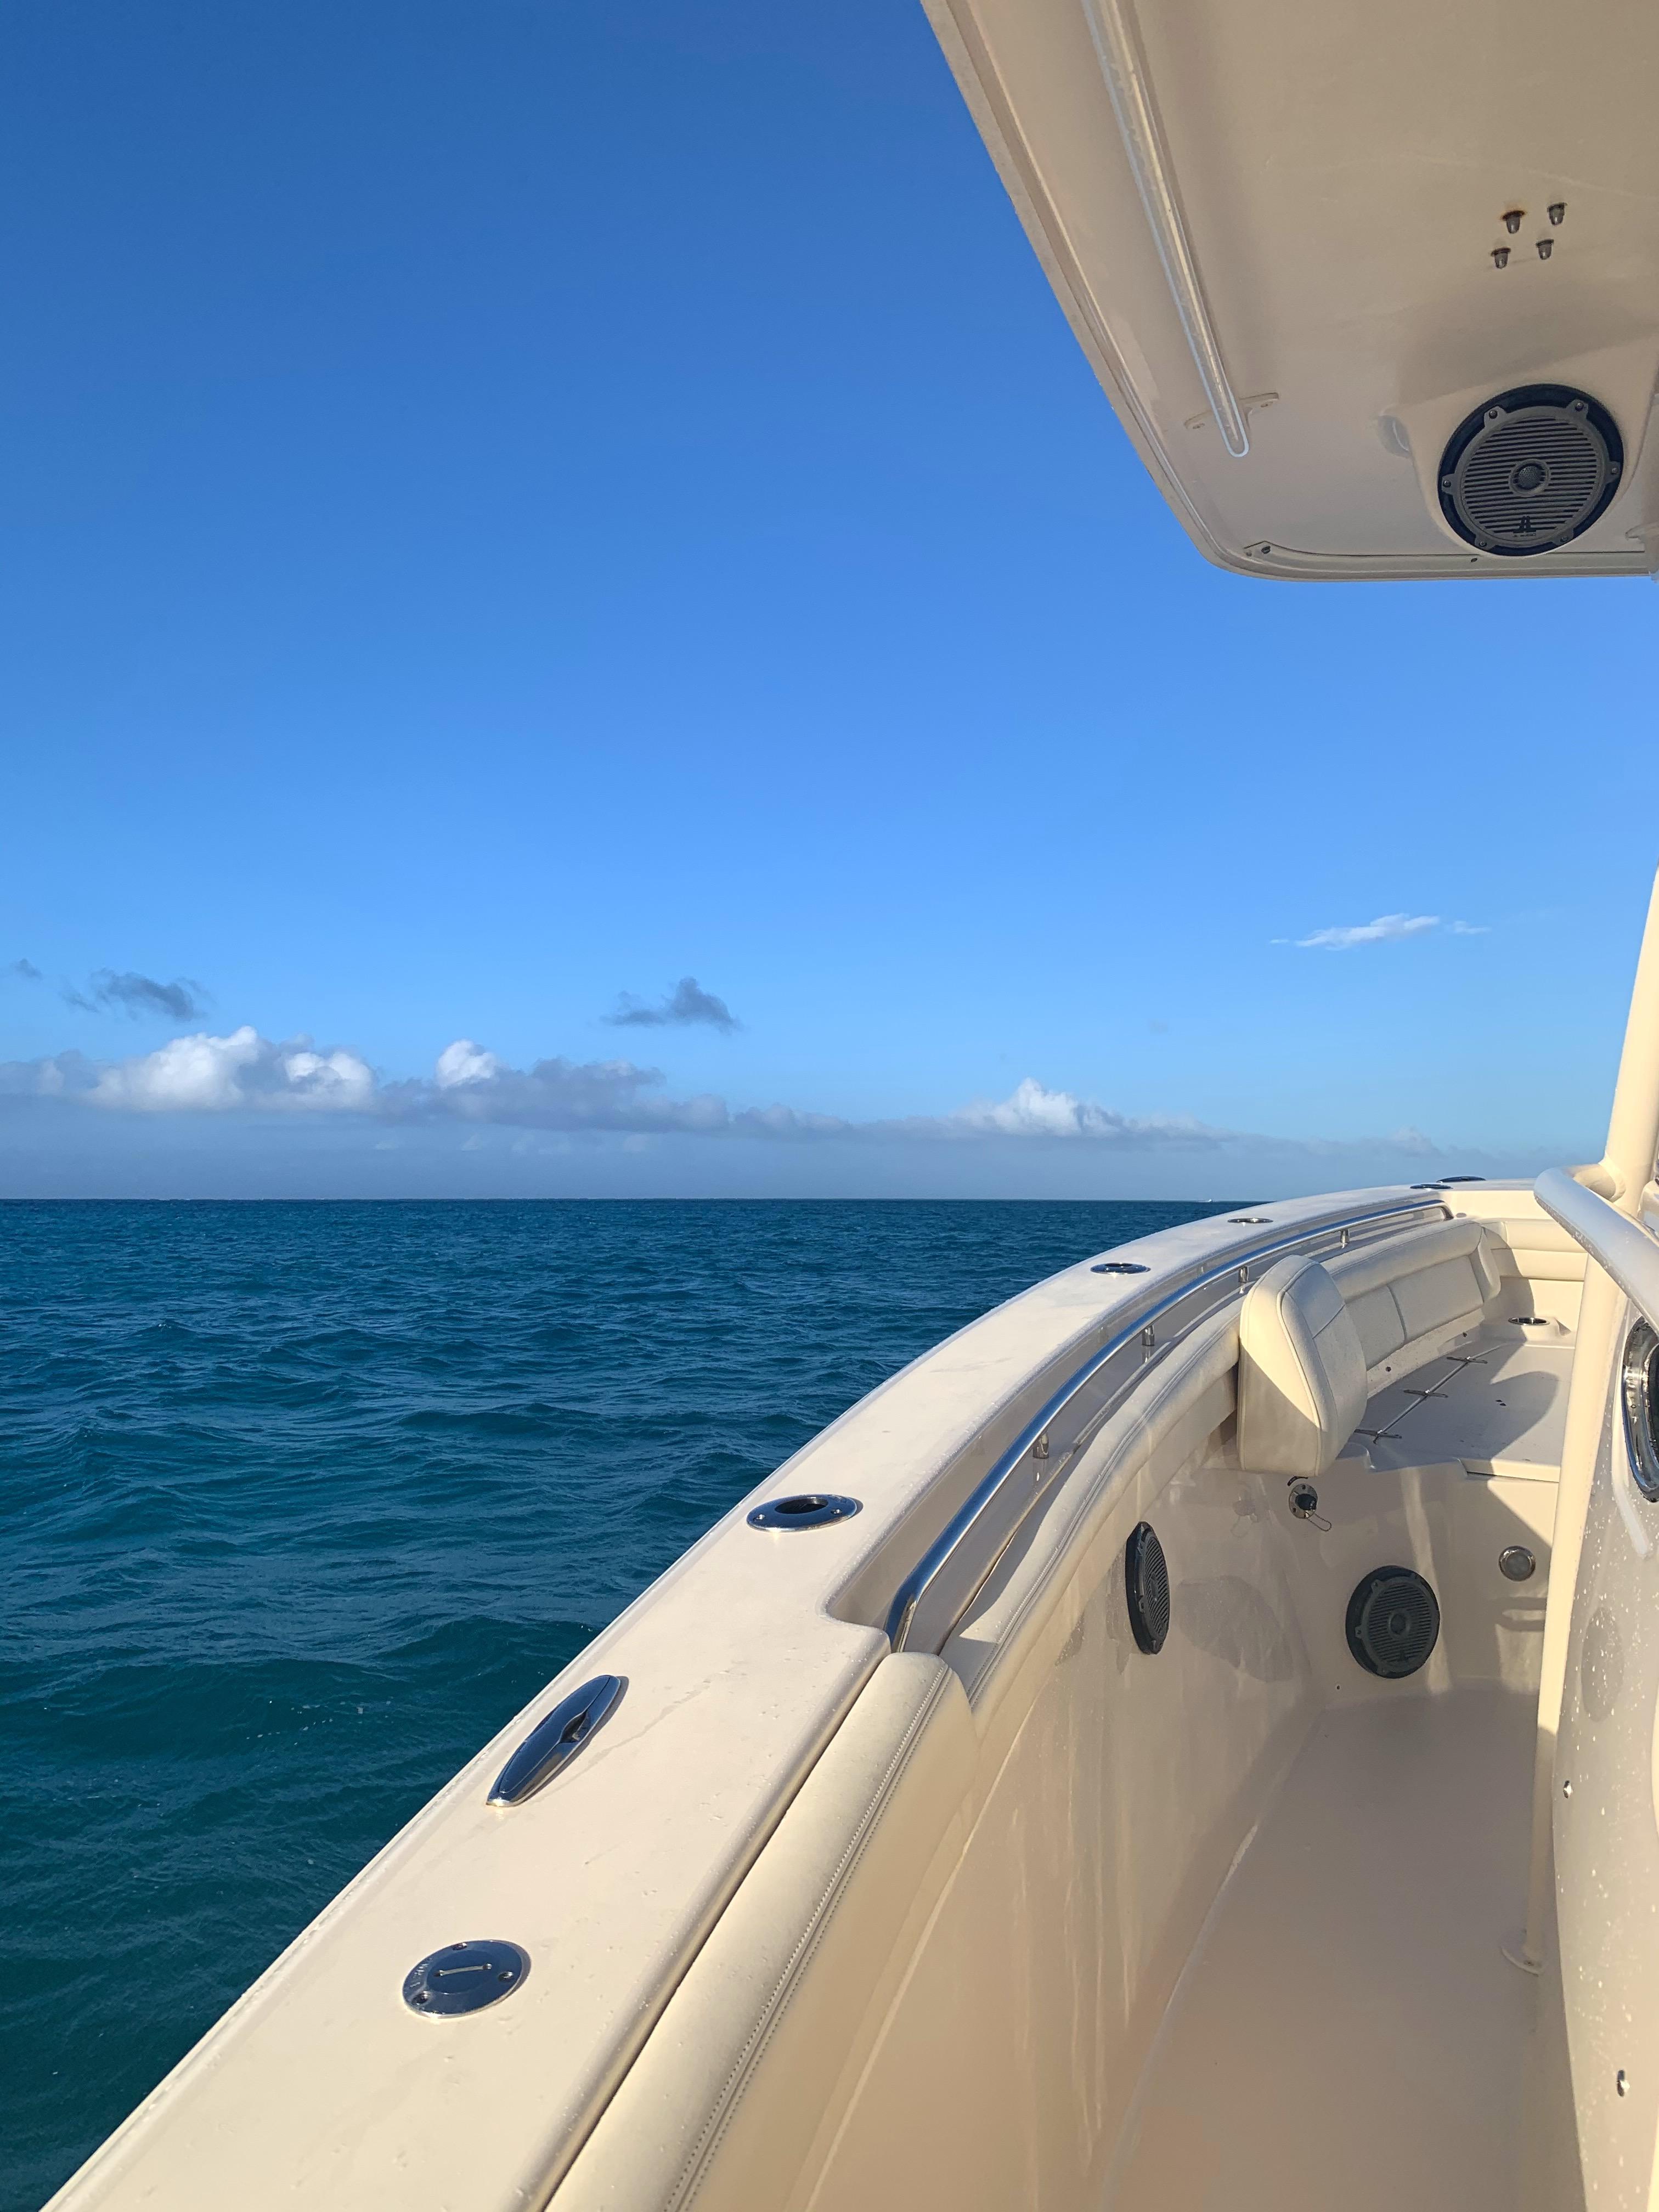 turksandcaicos-navis-charters-lustforthesublime